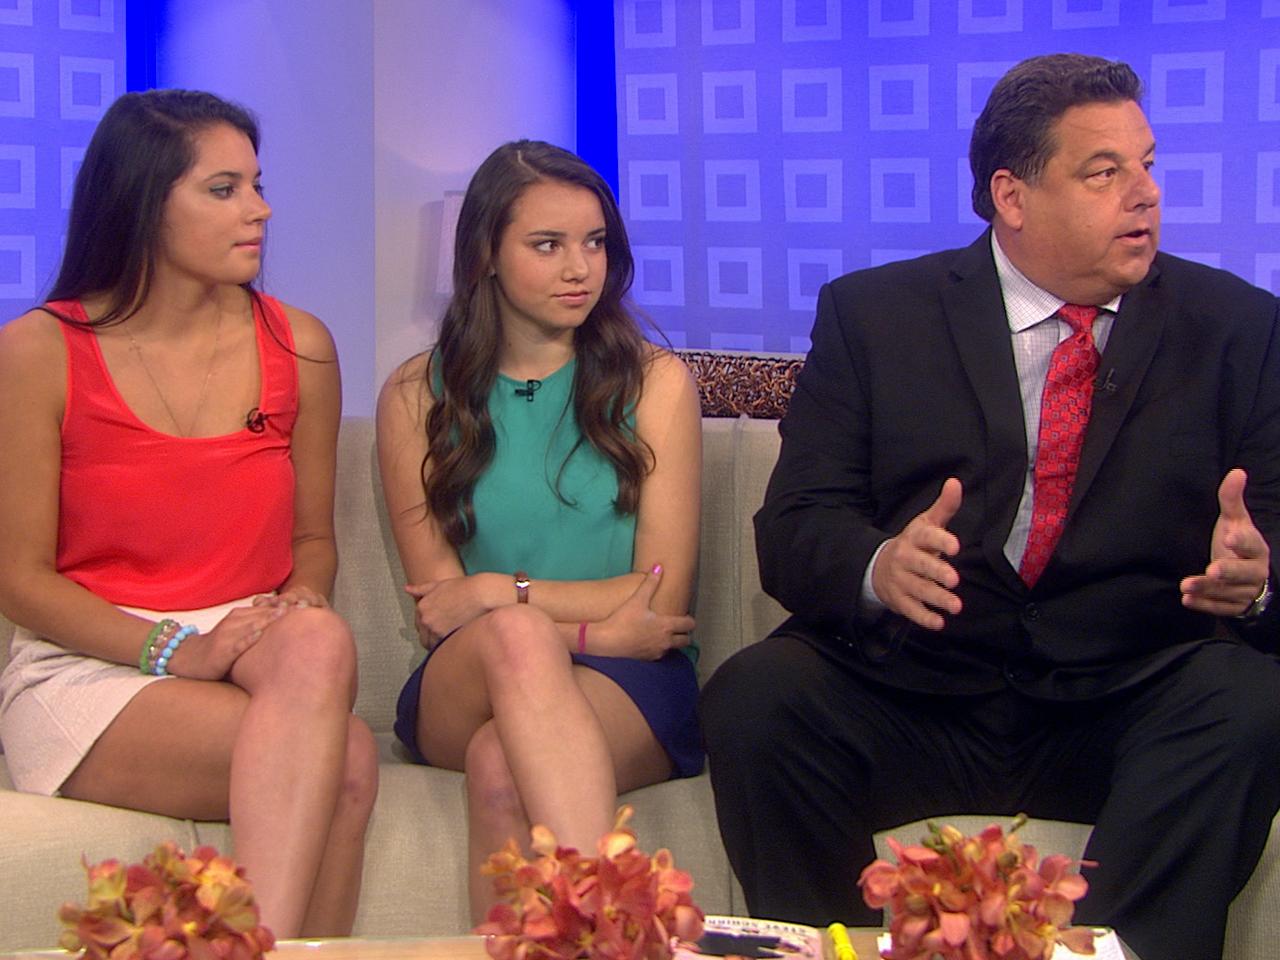 Actor Steve Schirripa S Tough Rules For Daughters